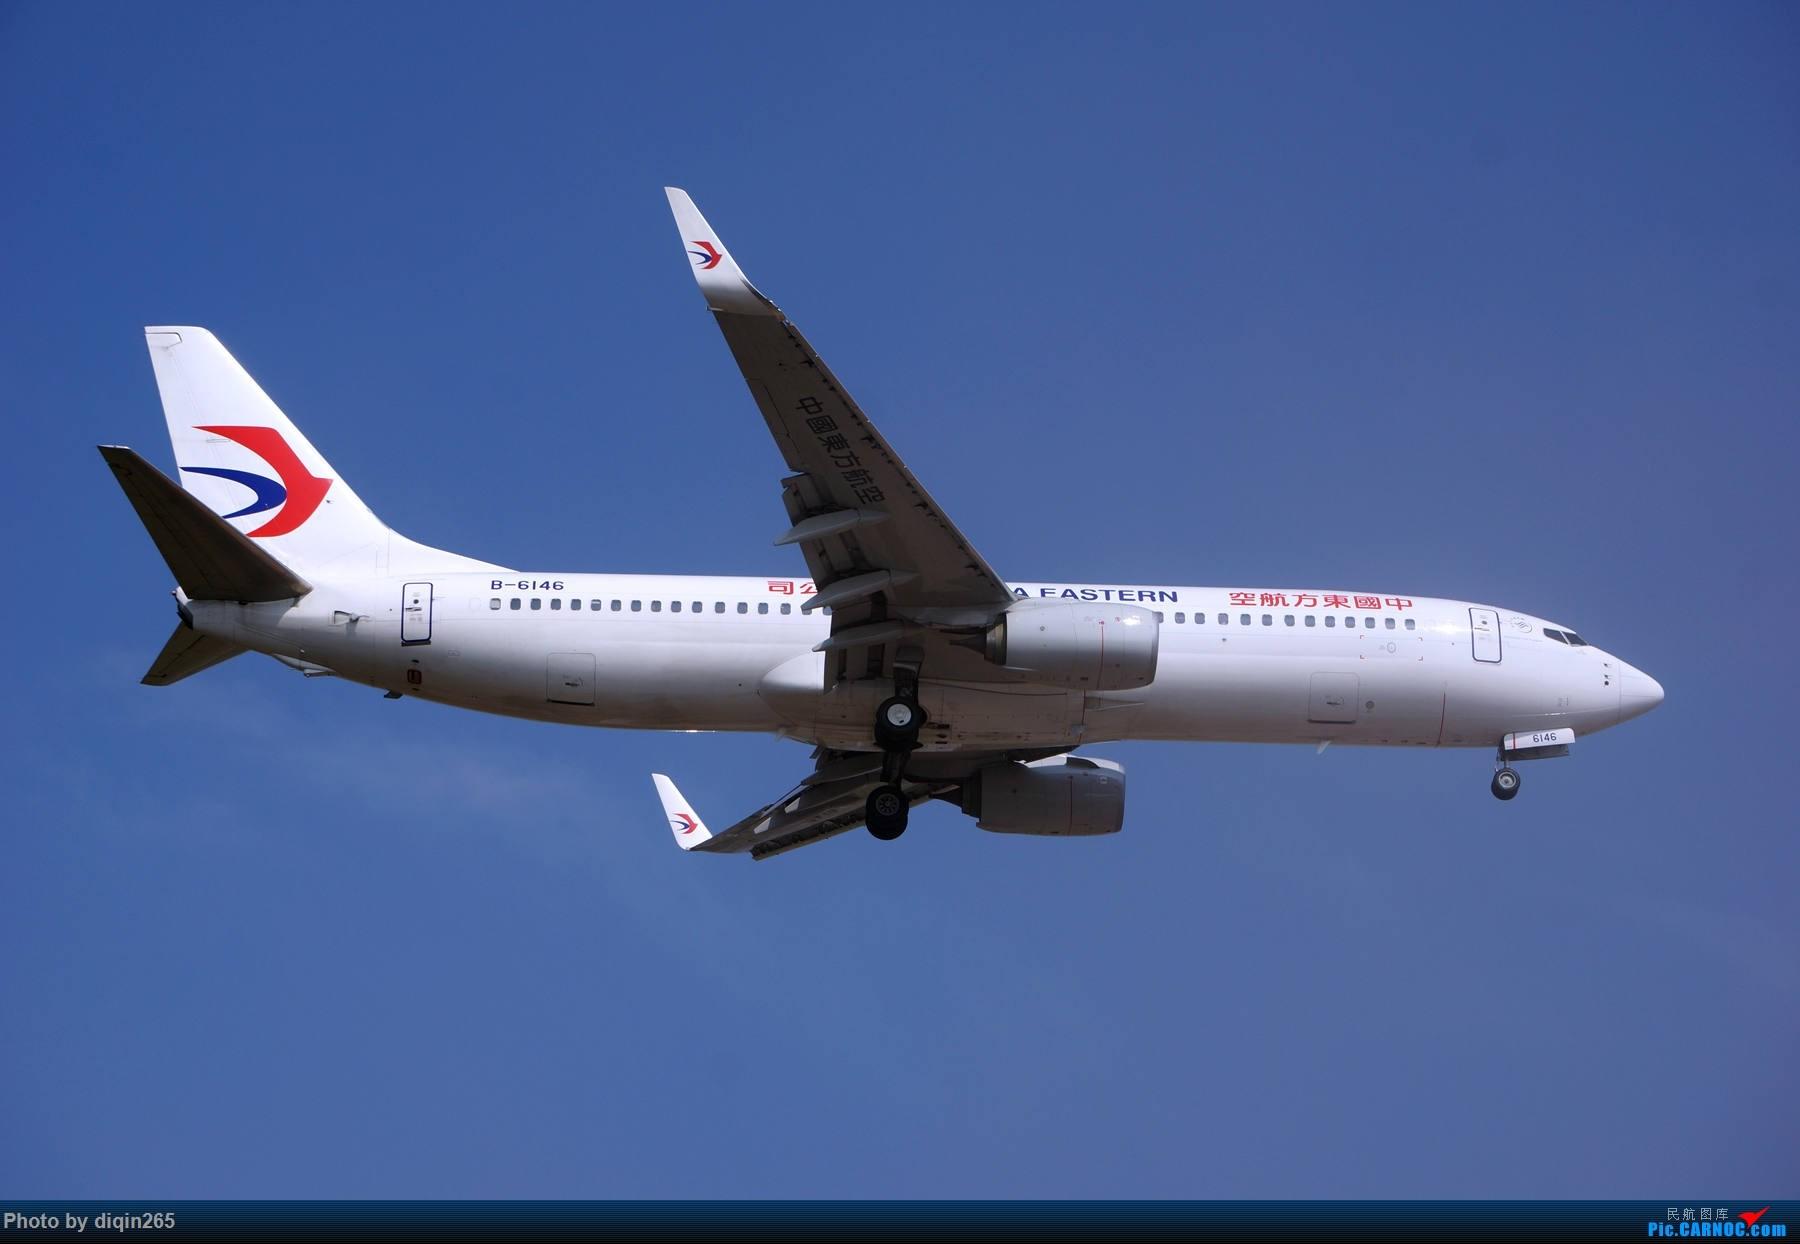 Re:[原创]6月在CKG的首次拍机 BOEING 737-800 B-6146 中国重庆江北国际机场